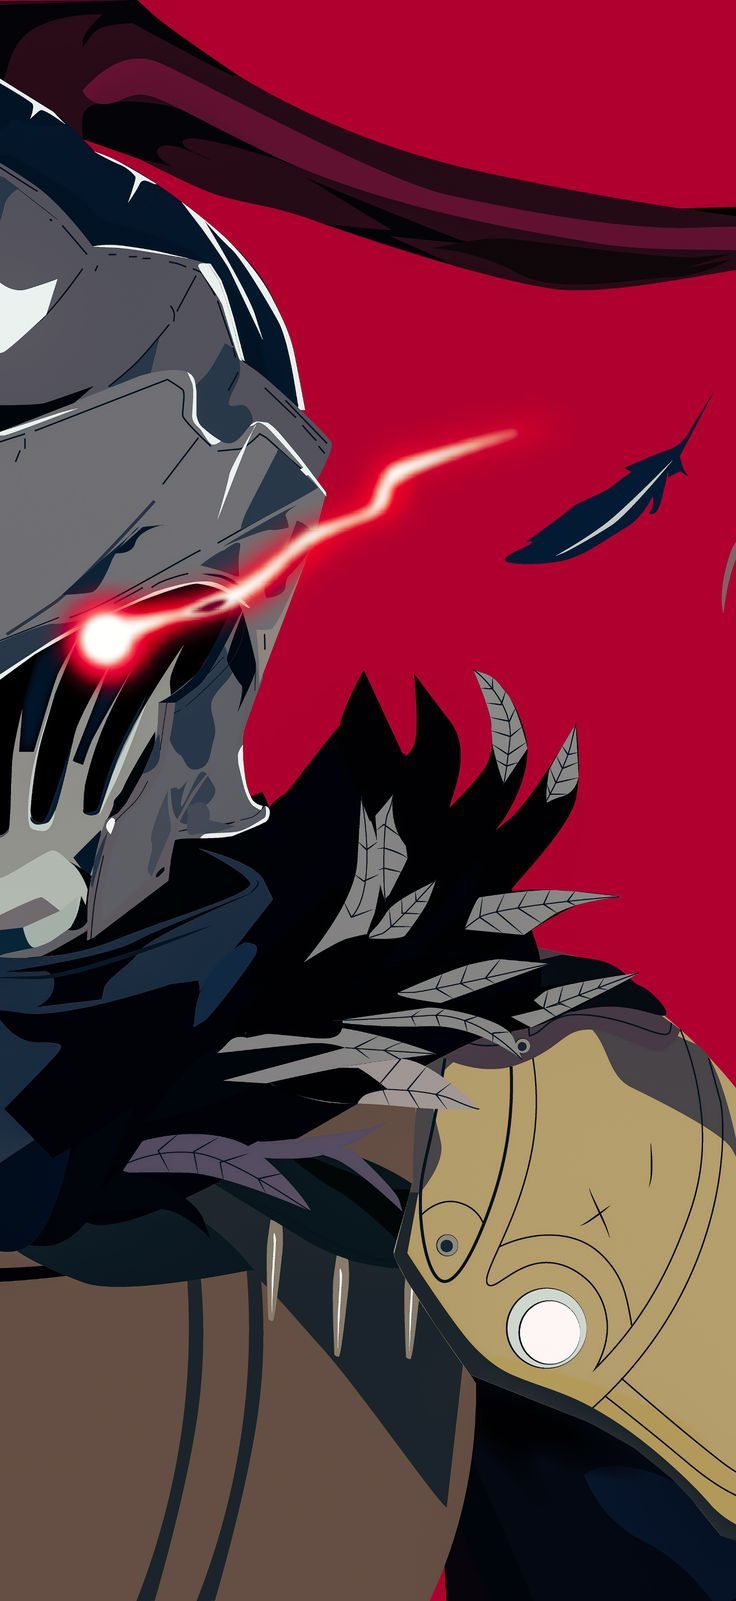 Goblin Slayer fanart manga anime animeboy GG